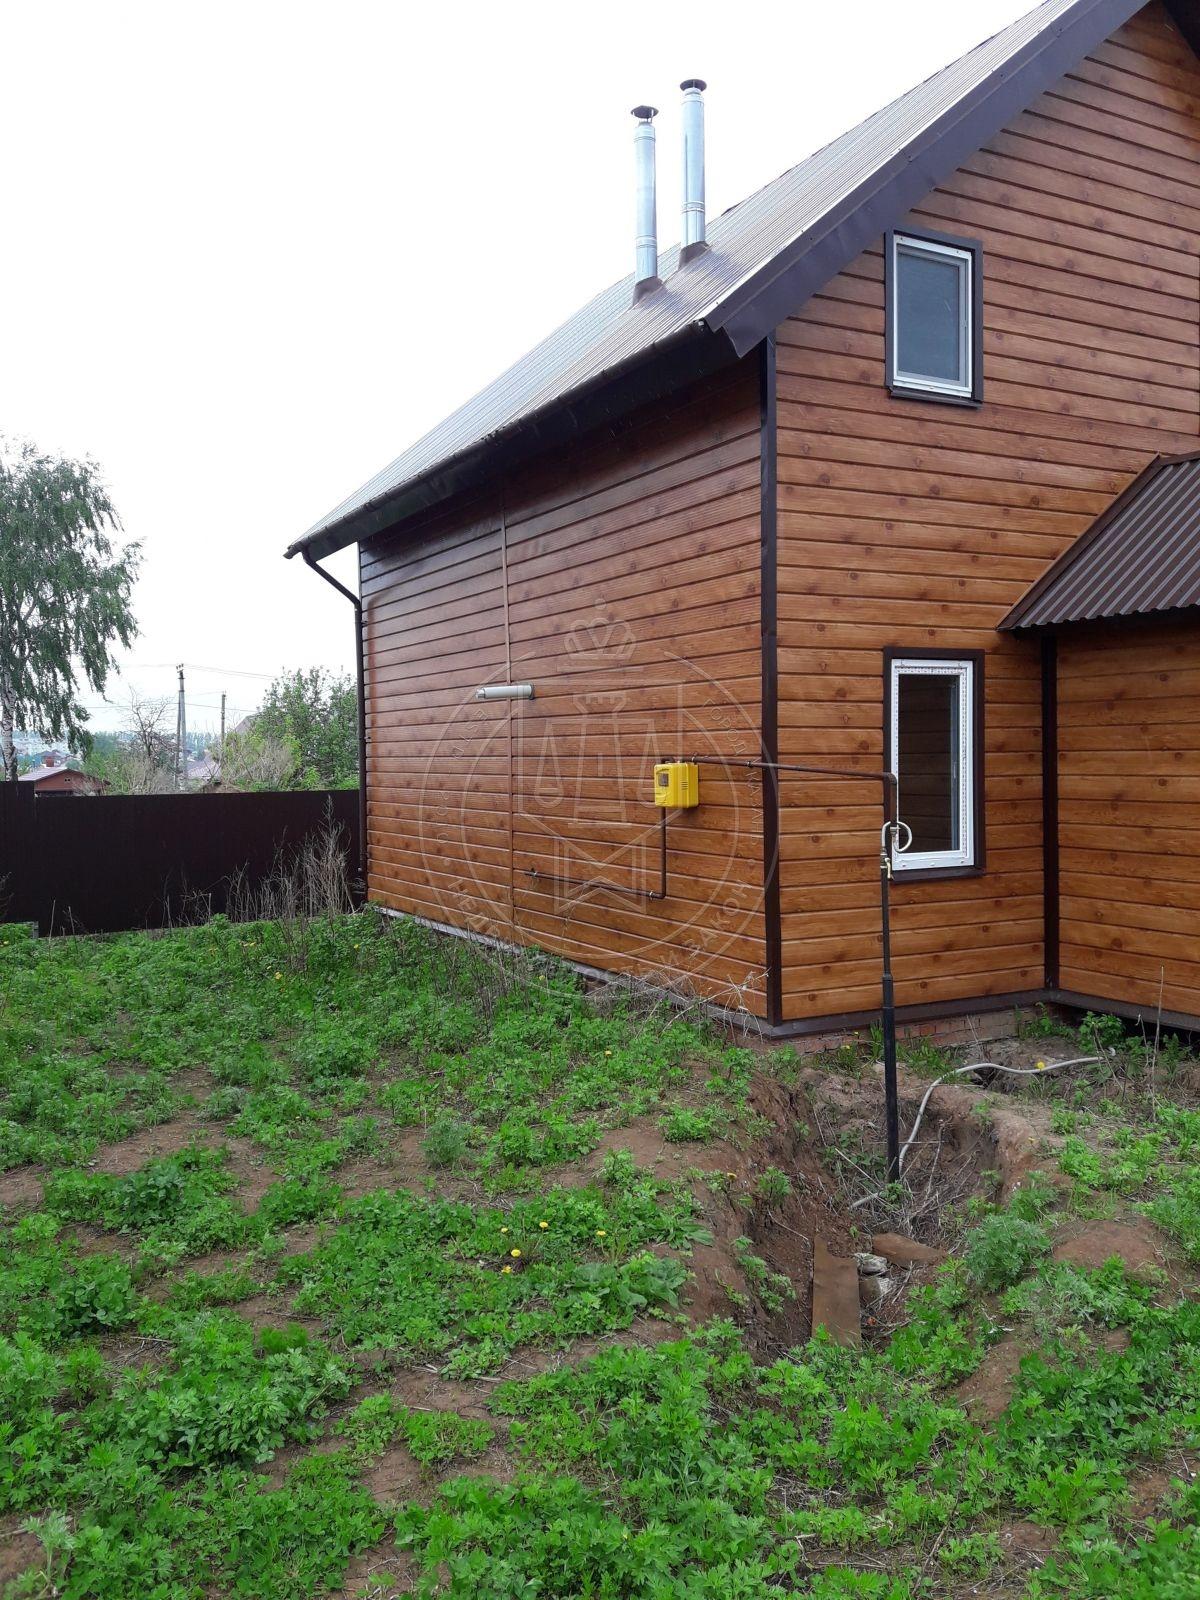 Продажа  дома п. Куюки, ул Центральная, 100.0 м² (миниатюра №2)